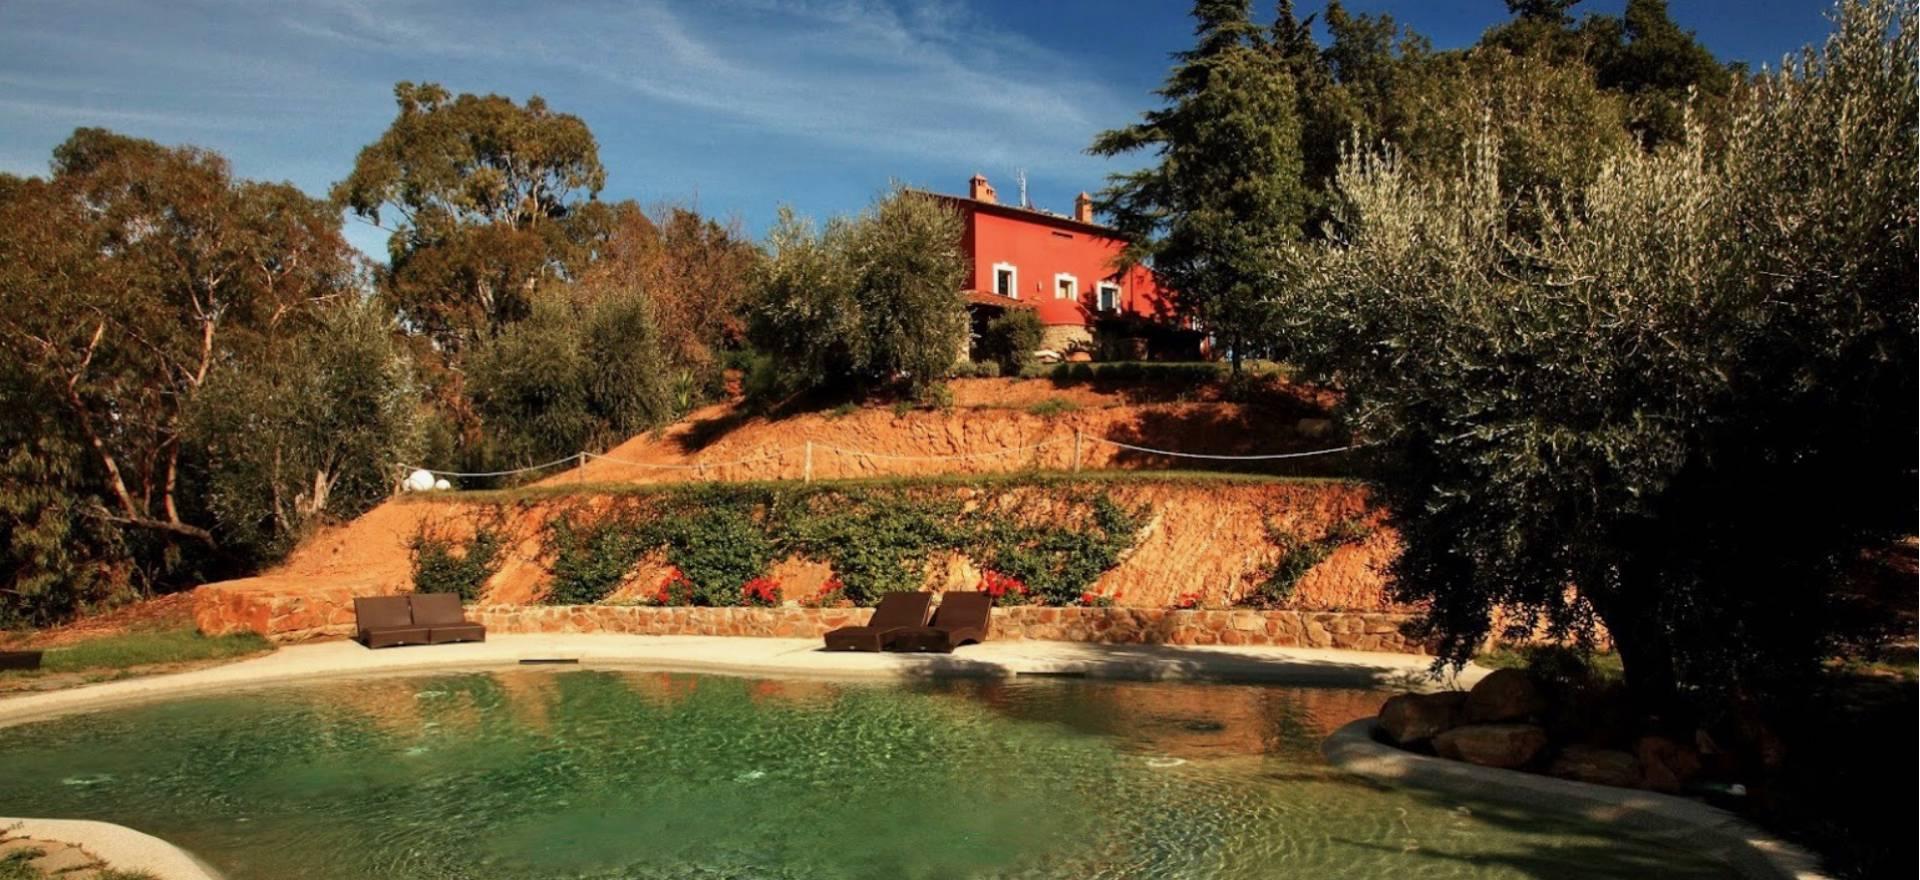 Agriturismo Toscane Prachtig country house in toscane met zeezicht